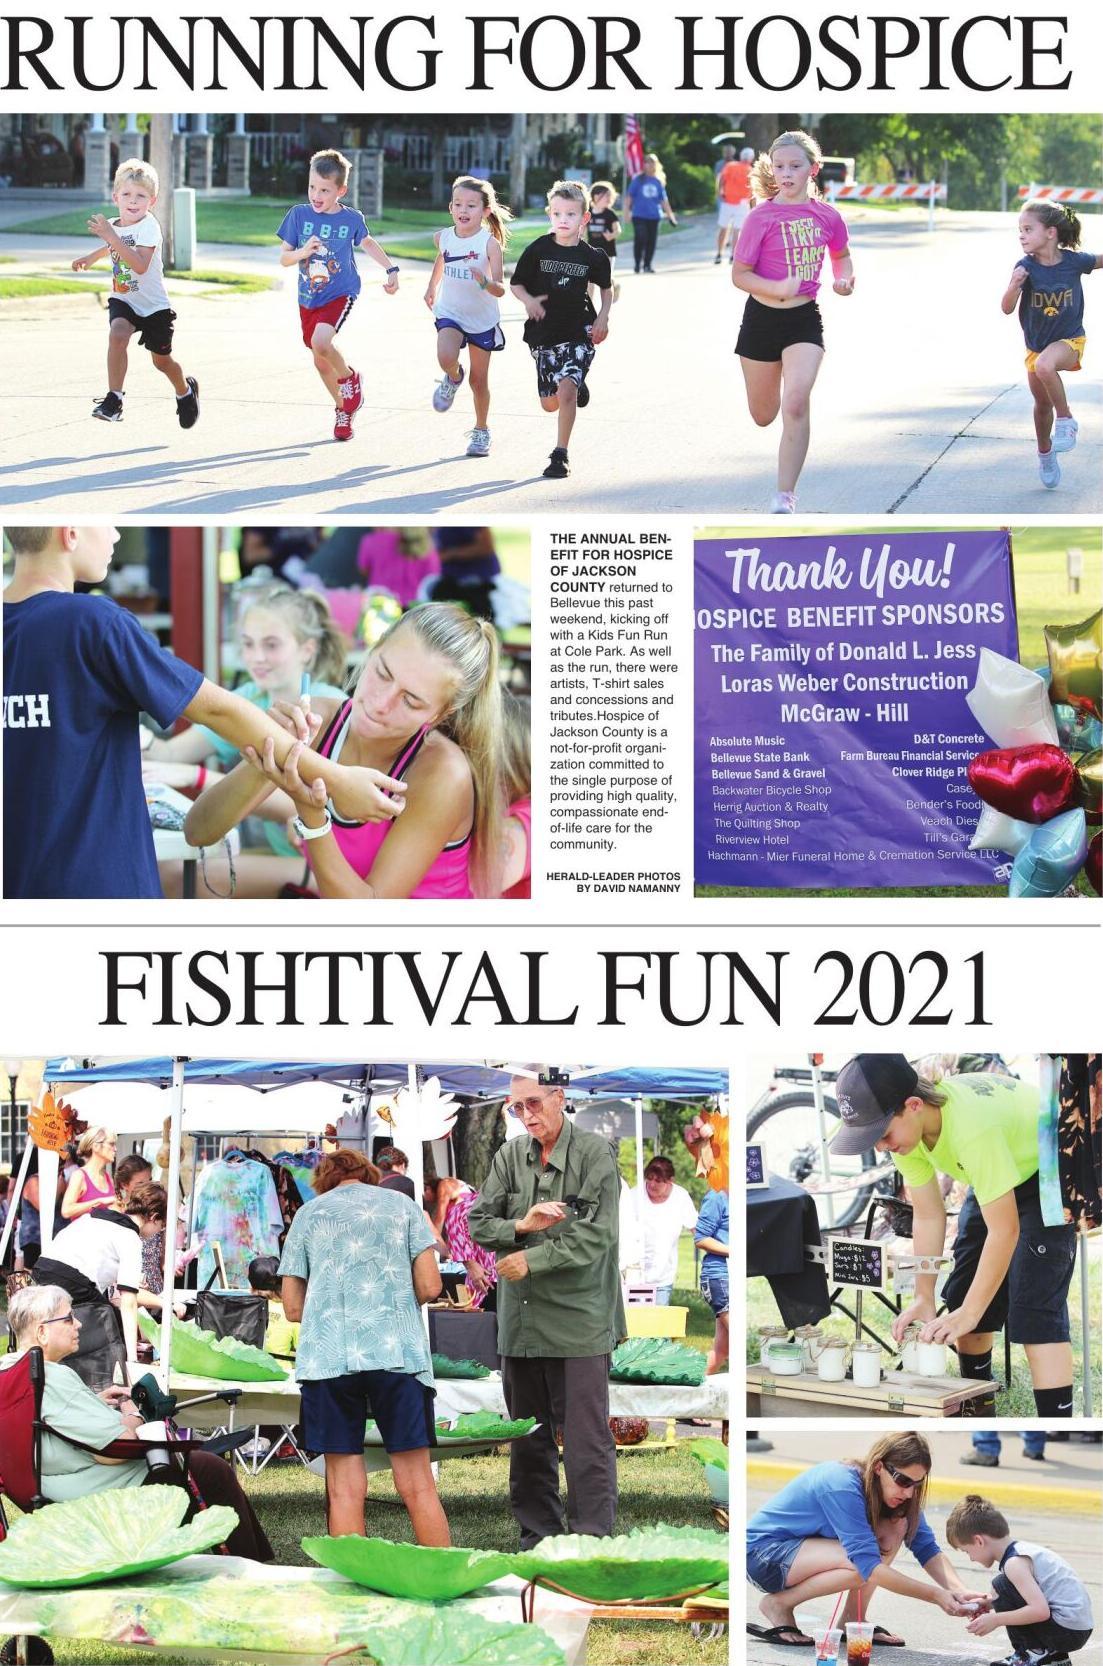 RUNNING FOR HOSPICE & FISHTIVAL FUN 2021